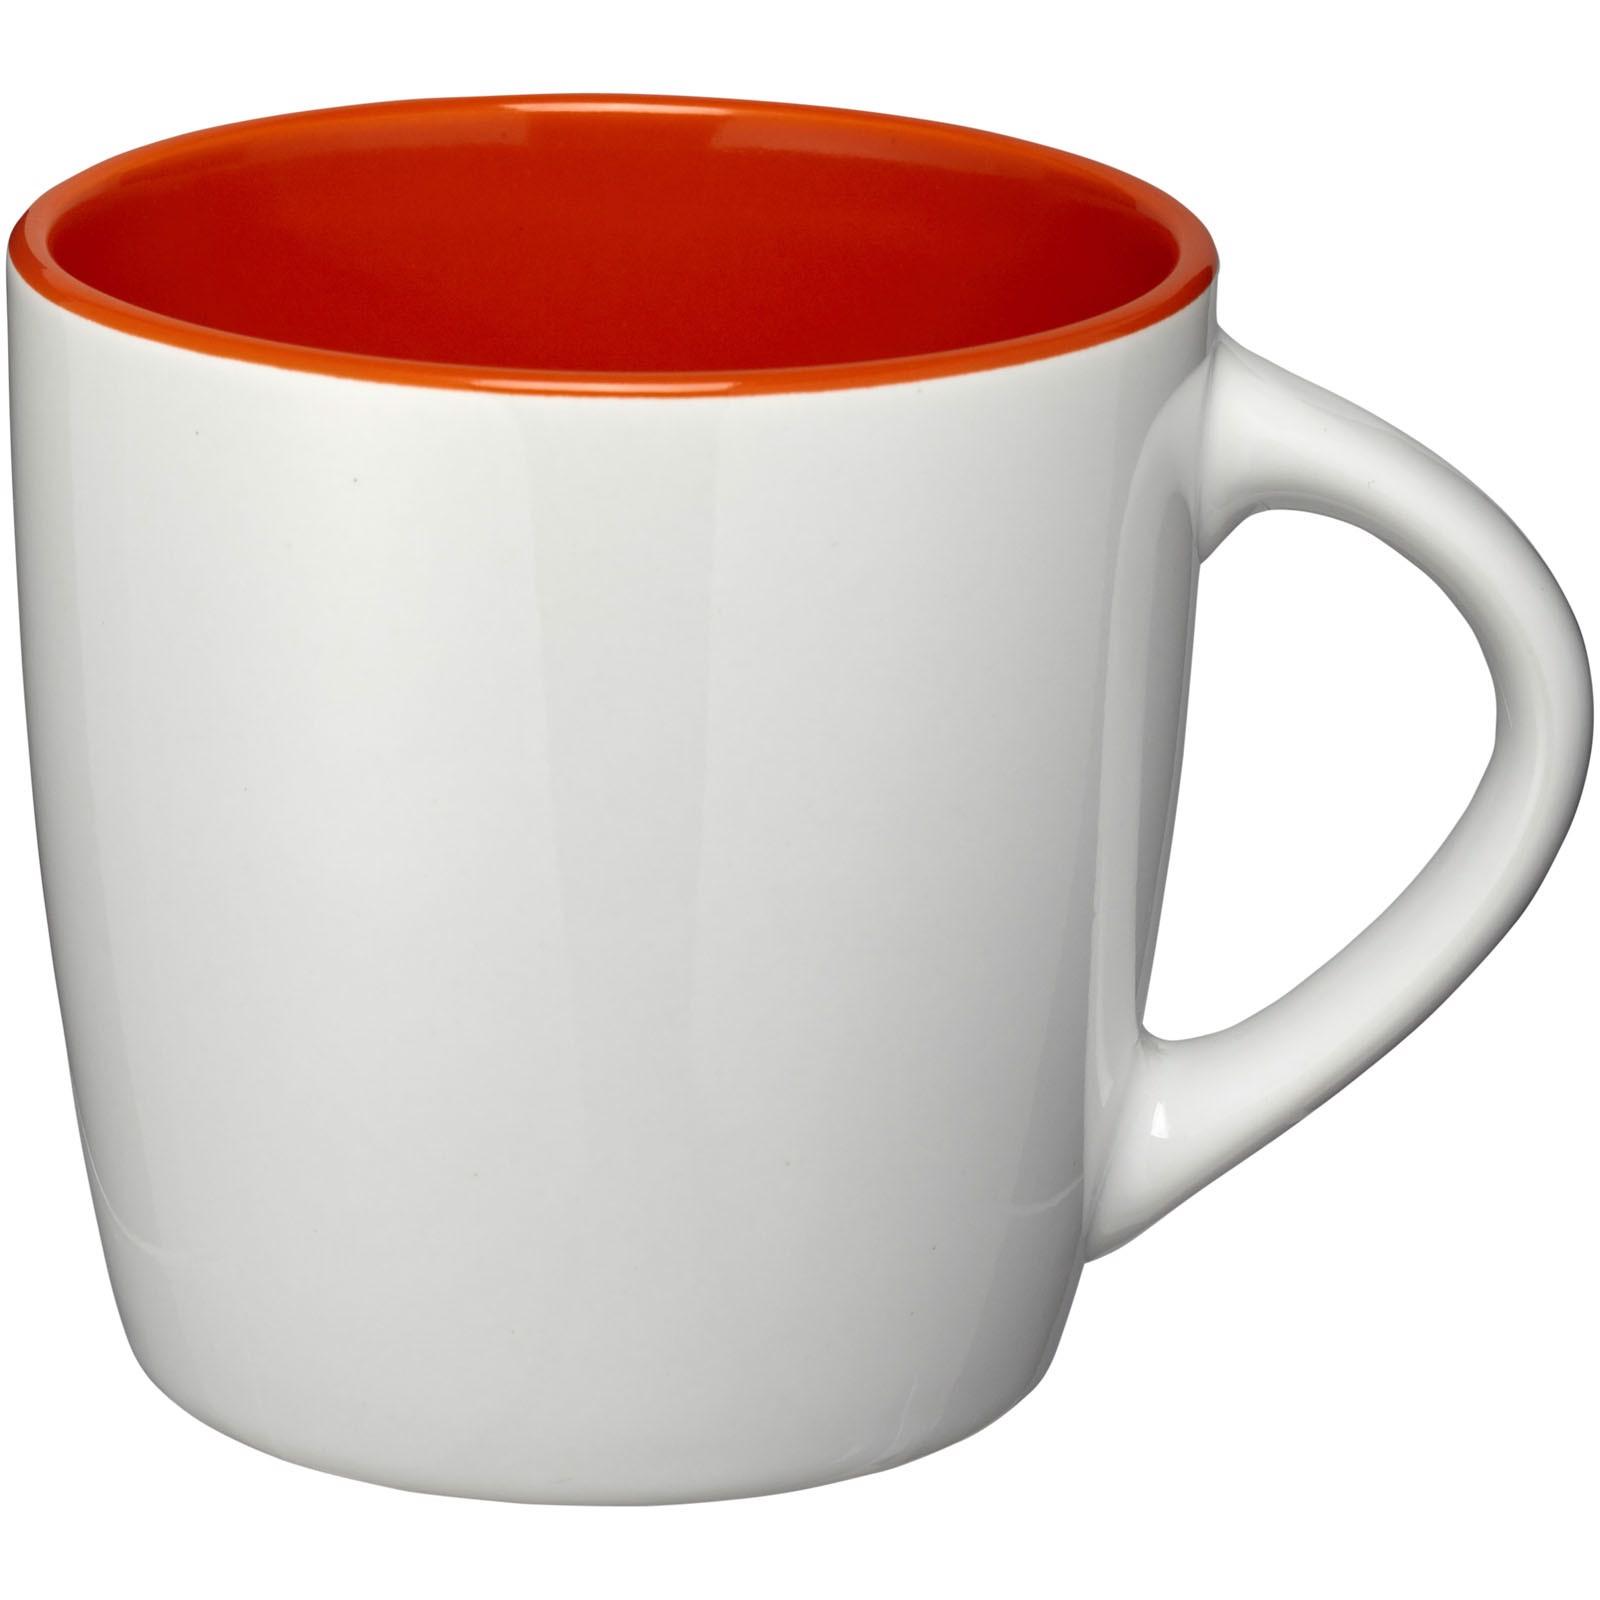 "Taza de cerámica de 340 ml ""Aztec"" - Blanco / Naranja"